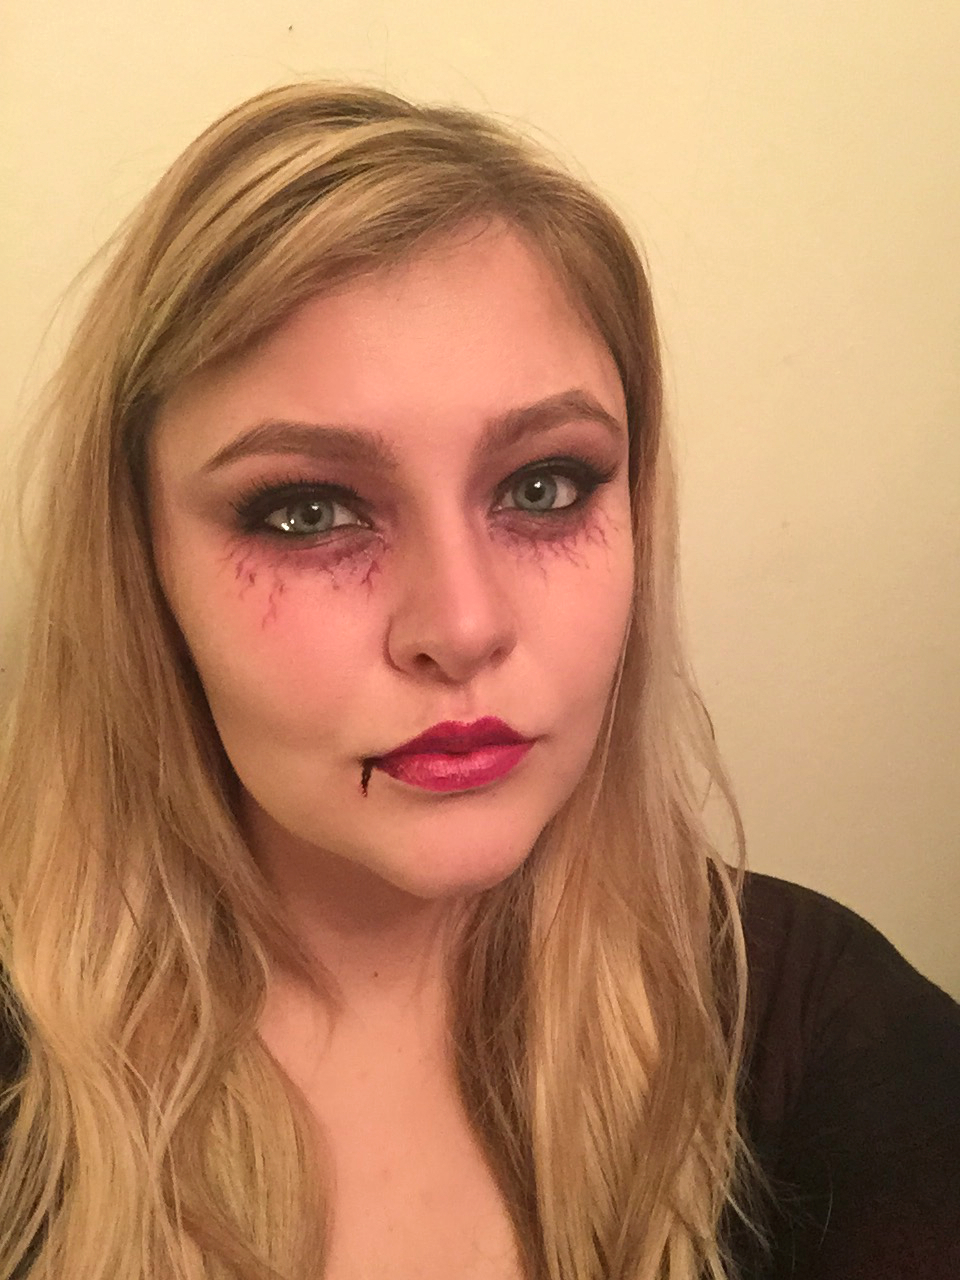 Glam Vampire Tutorial - Simple Halloween Makeup #3   Bristolian Beauty